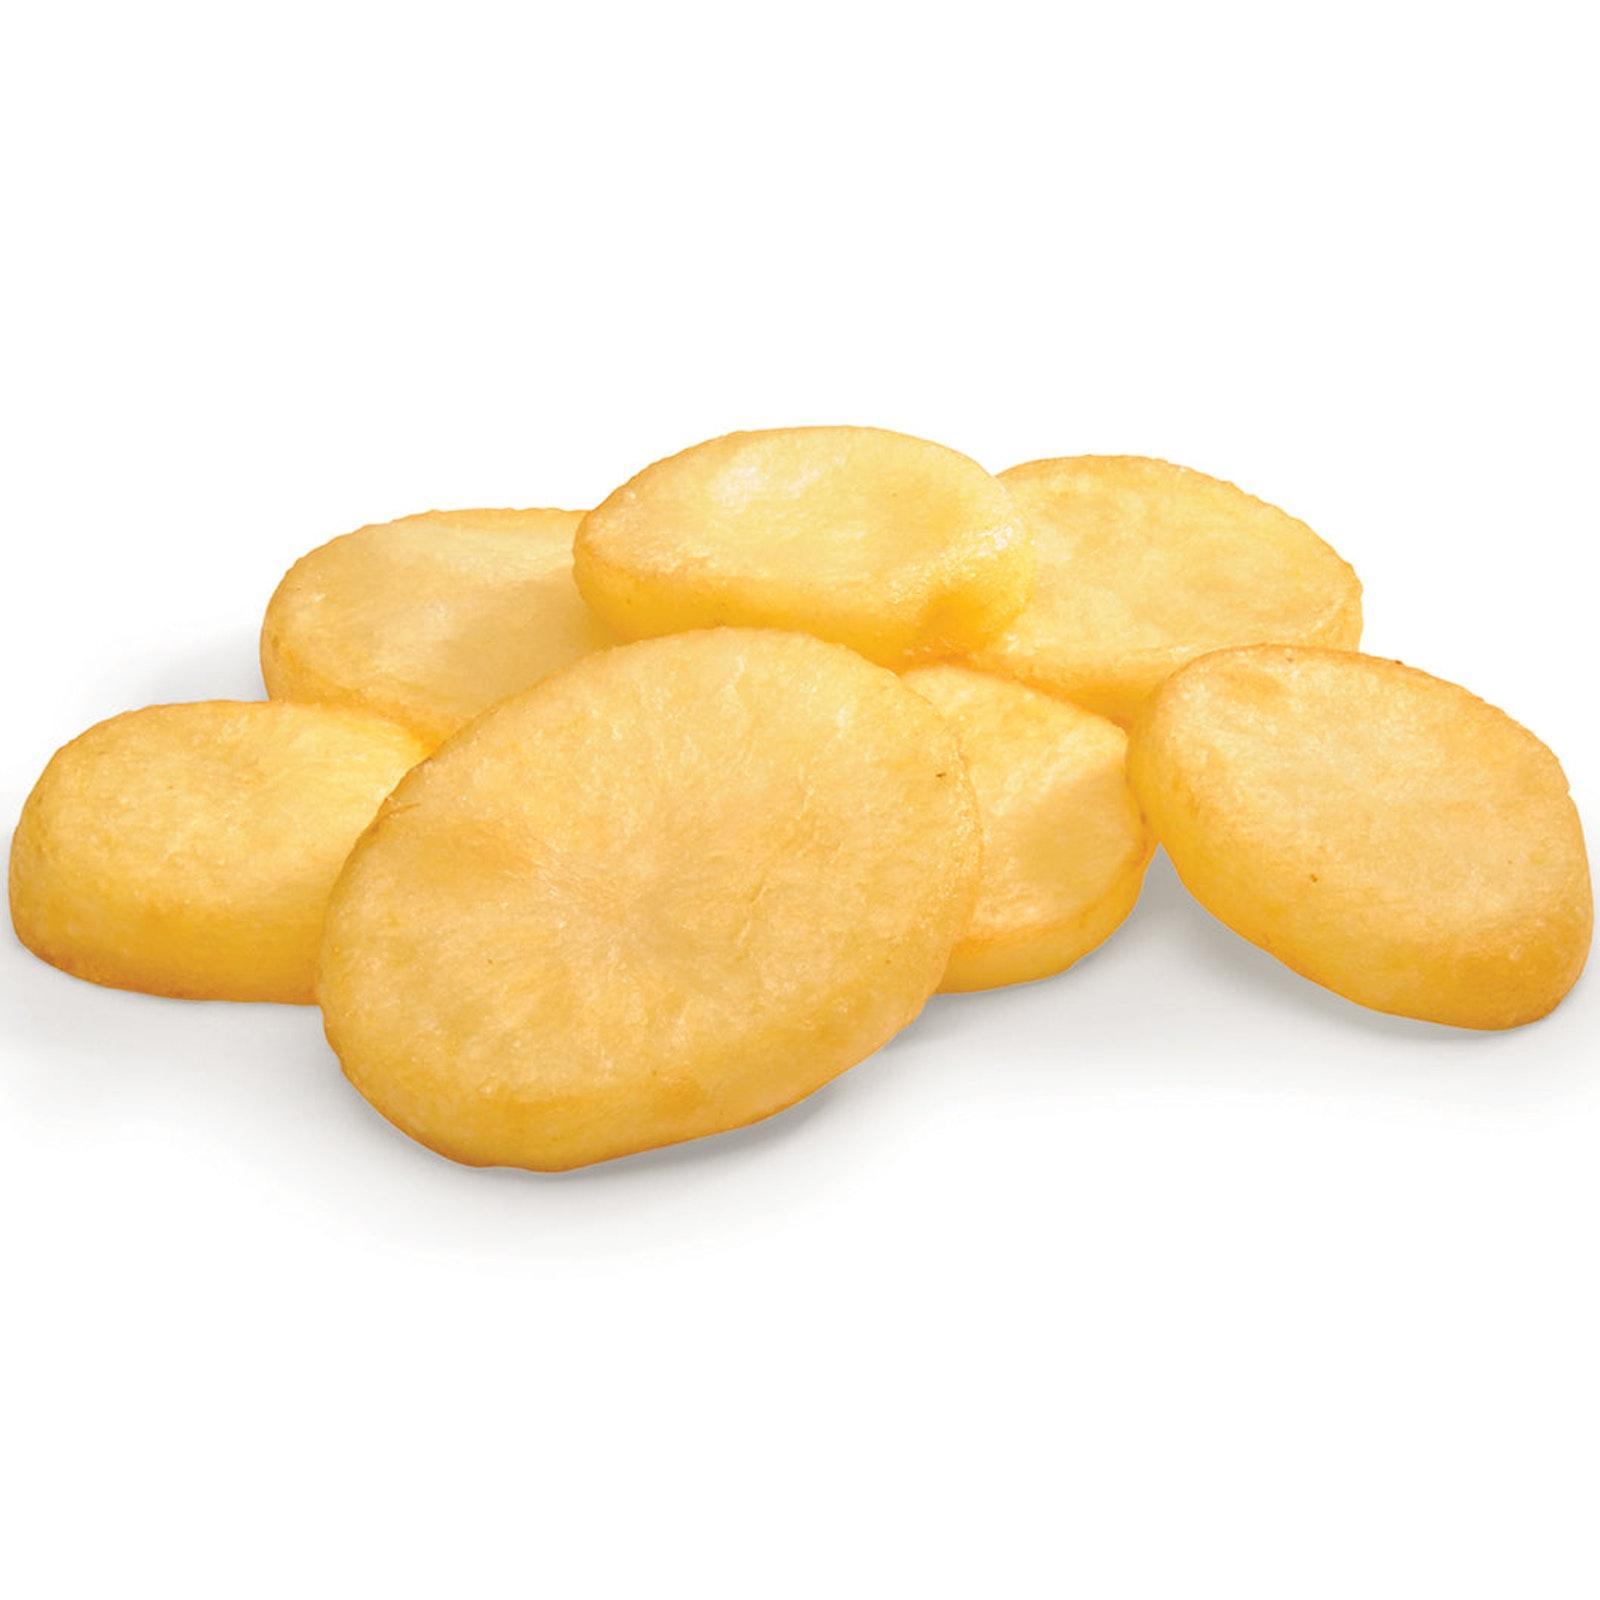 McCain Sliced Breakfast Potatoes